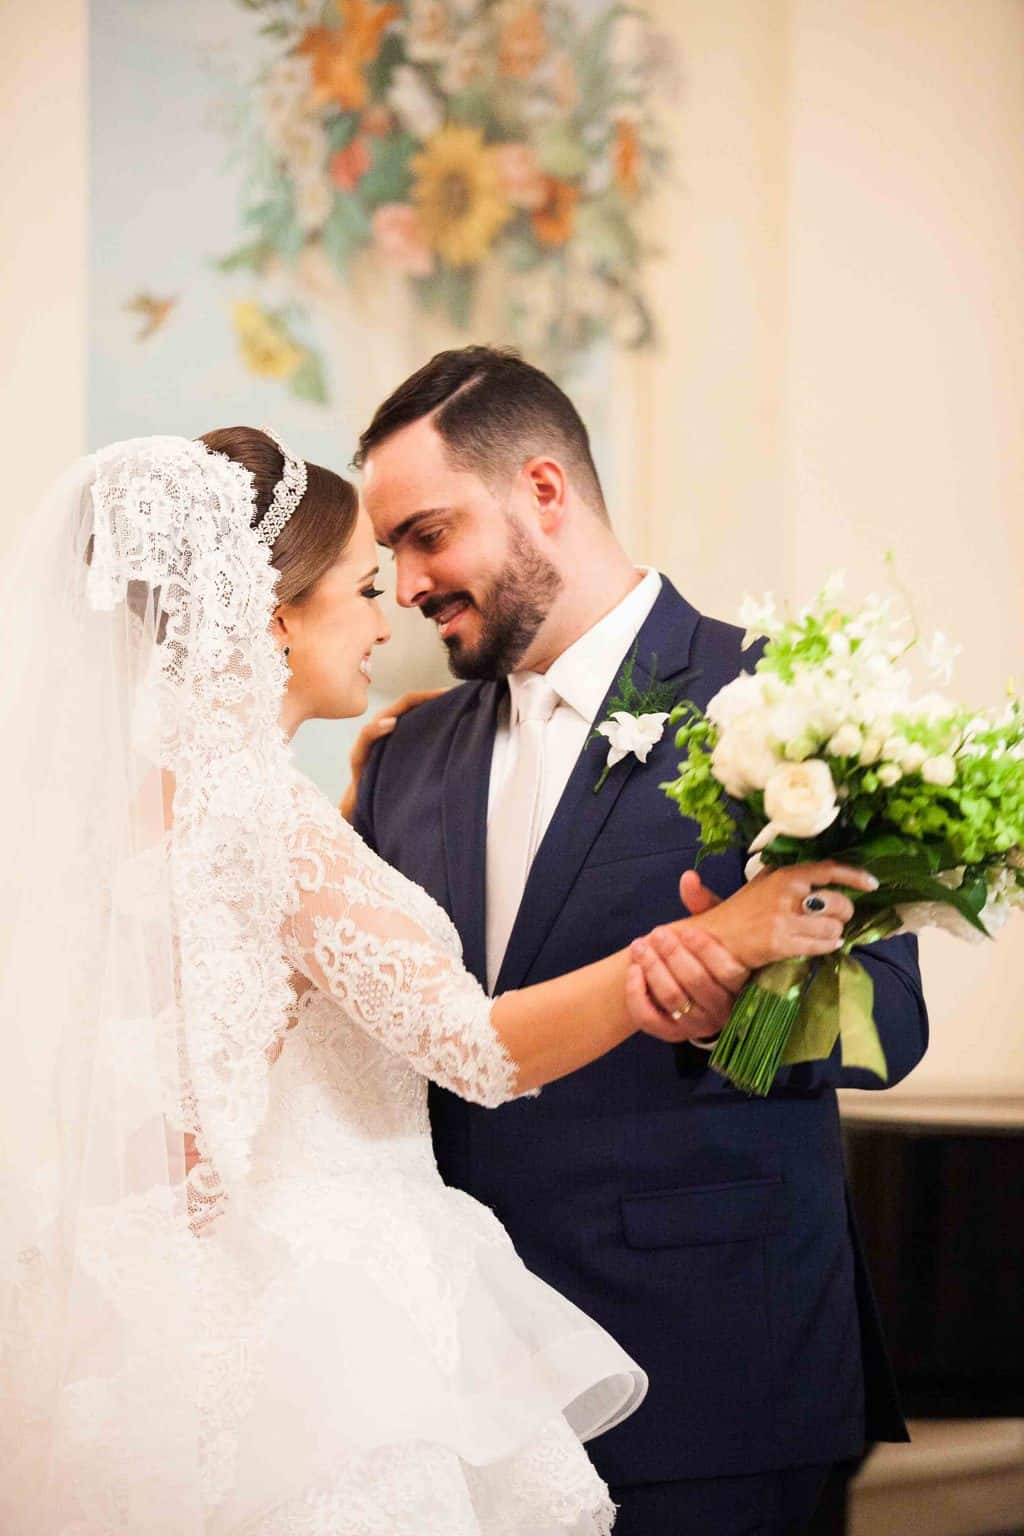 Casamento-Clássico-Casamento-tradicional-Copacabana-Palace-Monica-Roias-Poses-Casal-Ribas-Foto-e-Vídeo-Ricardo-Almeida-Tuanny-e-Bernardo-CaseMe